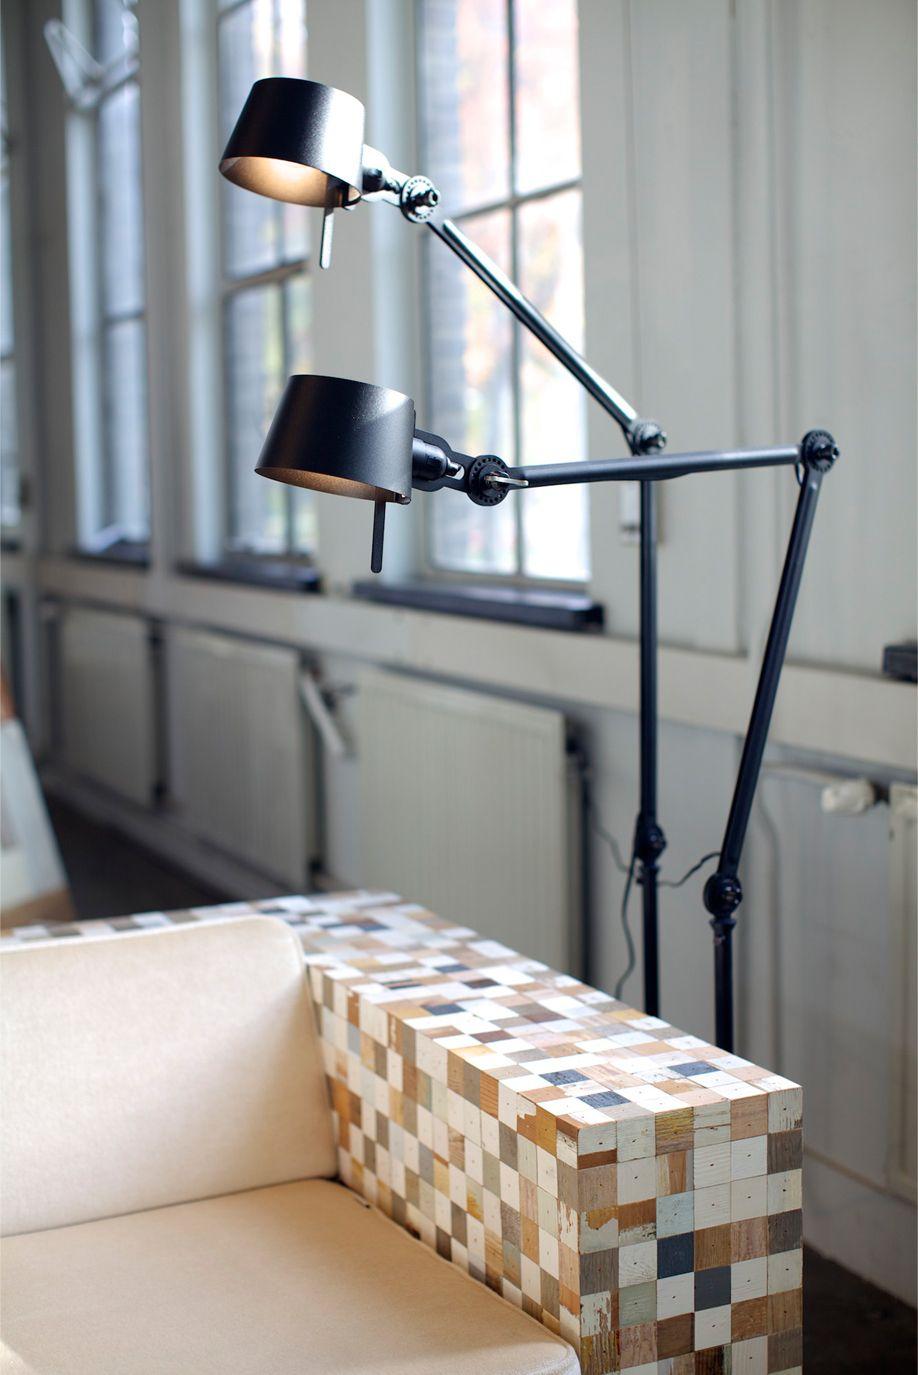 Tonone Bolt Lamp At Piet Hein Eek Www Tonone Com Lampen Plafondverlichting Vloerlamp